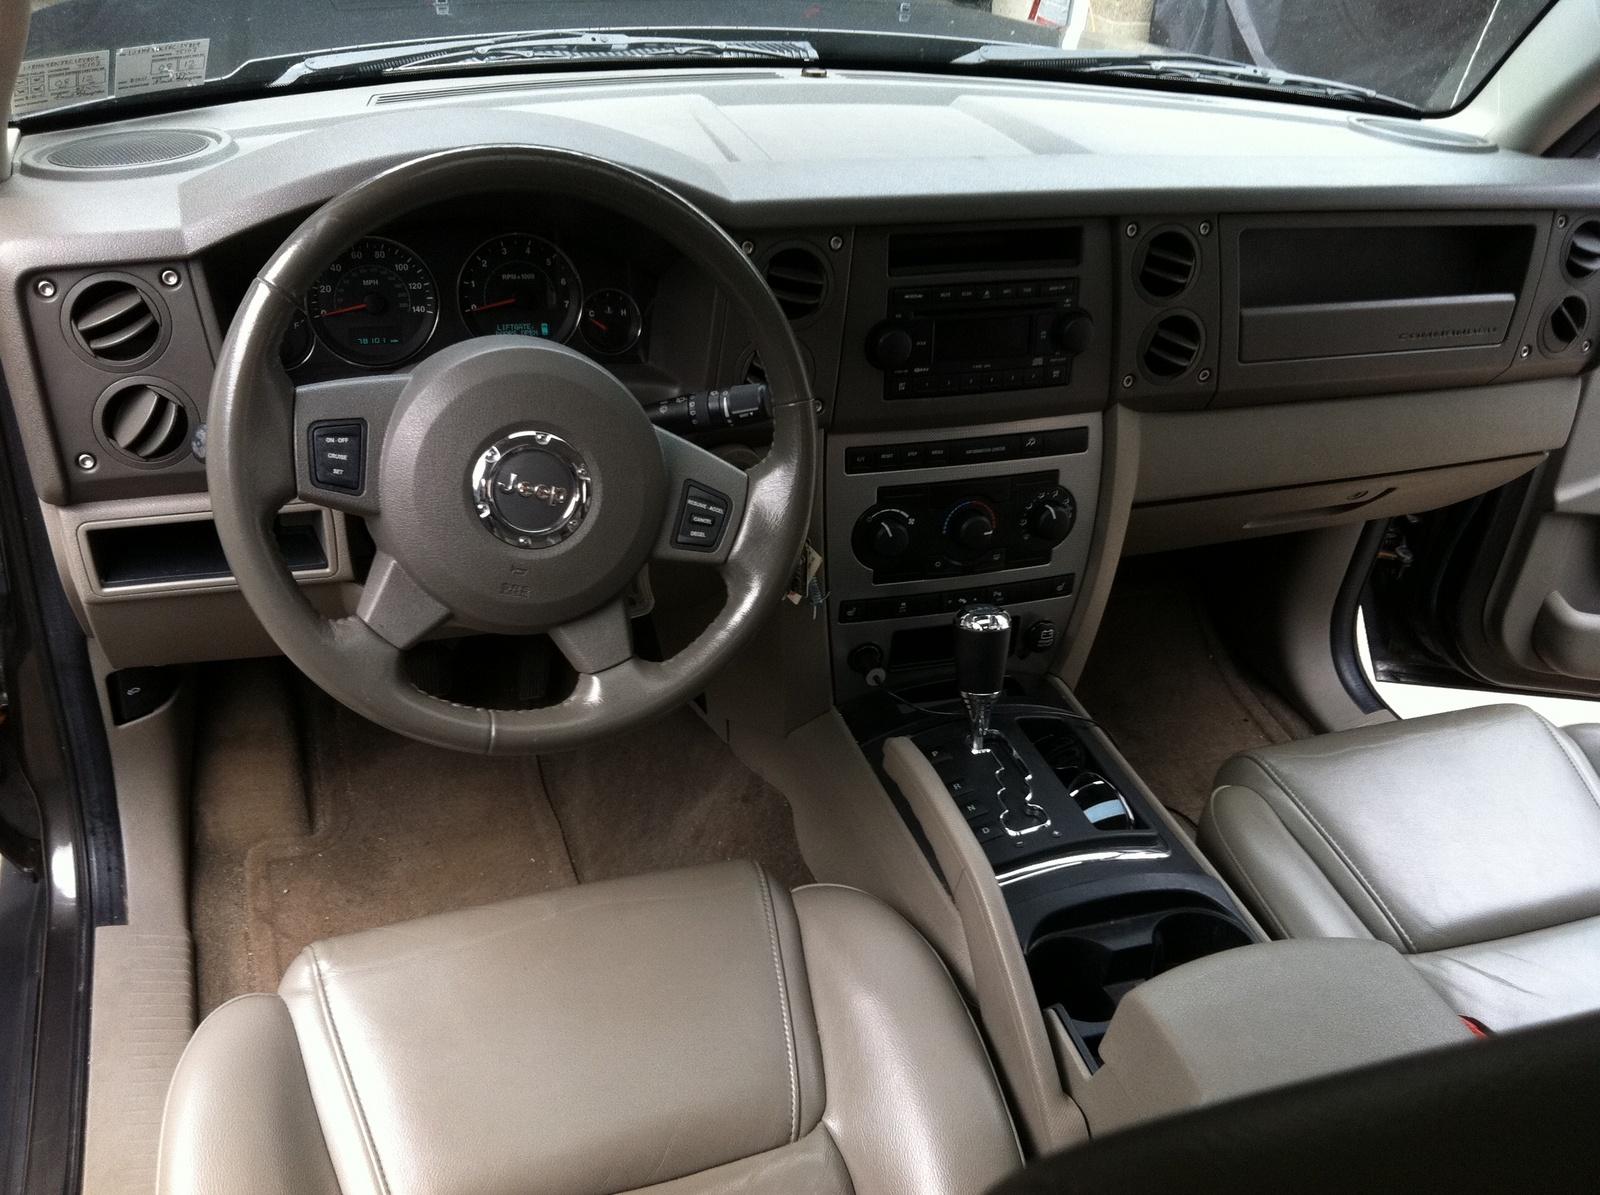 2006 Jeep Commander Interior